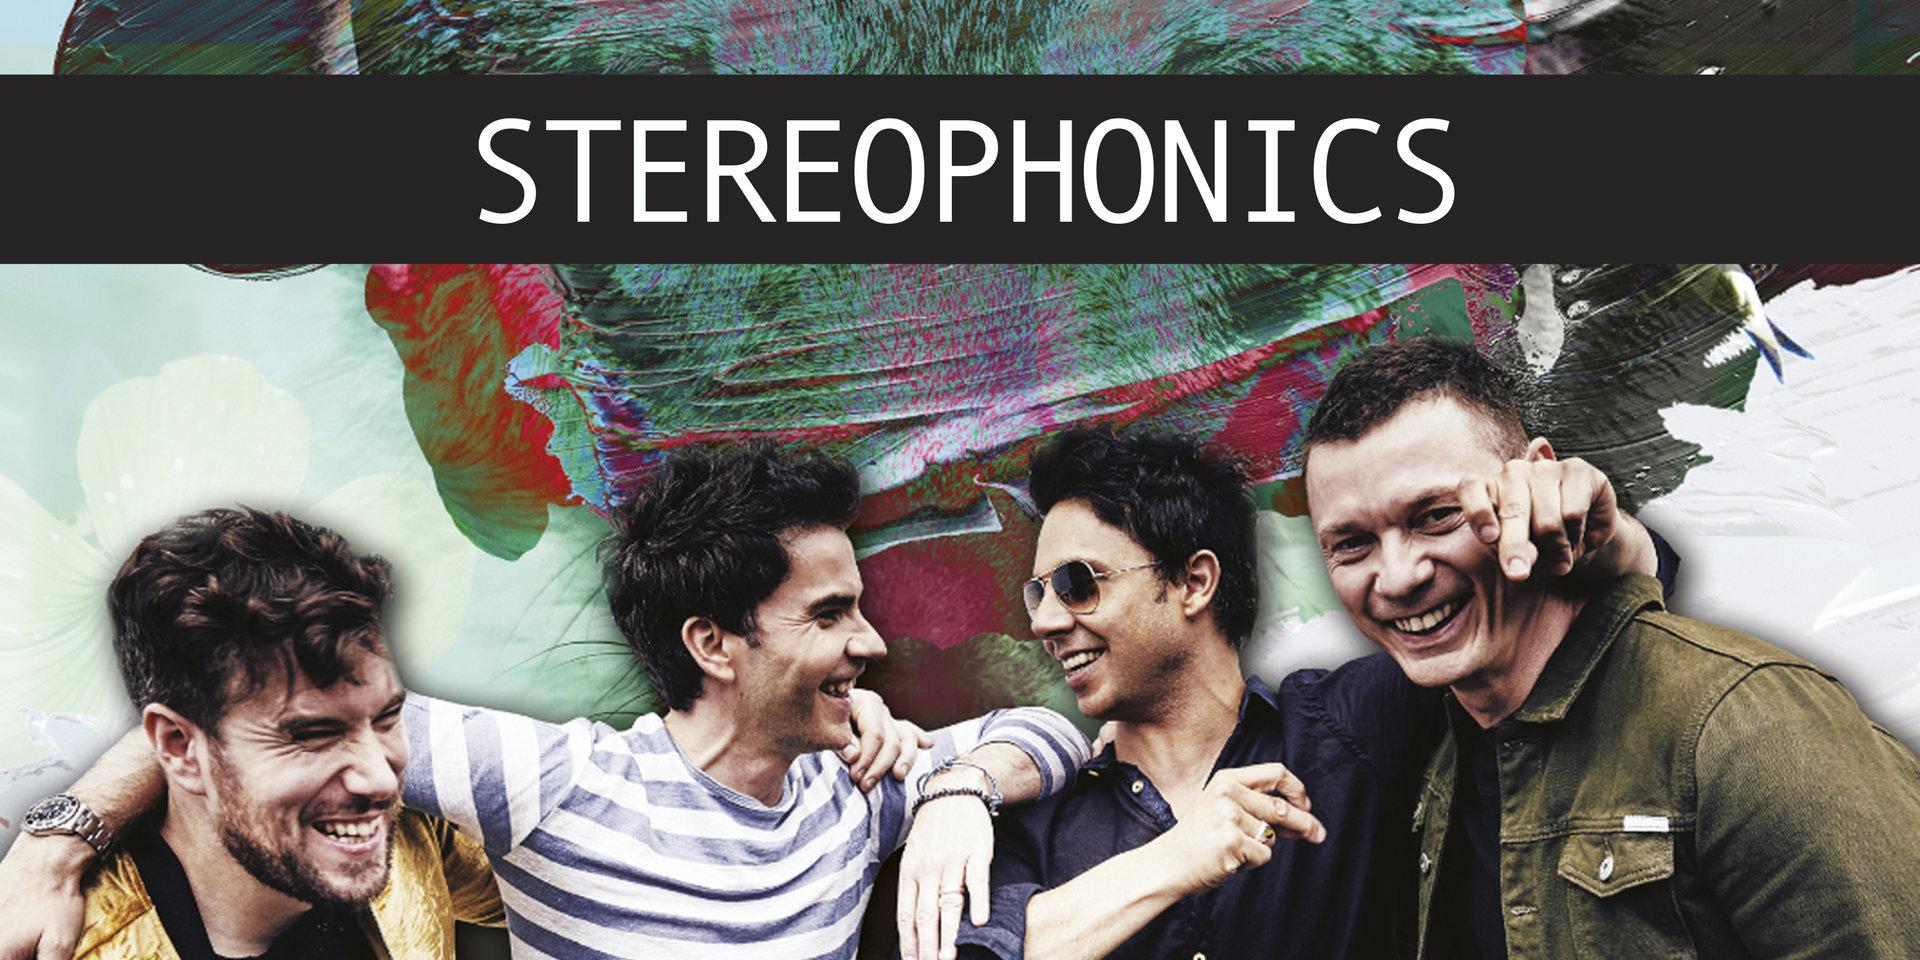 Stereophonics en El Plaza